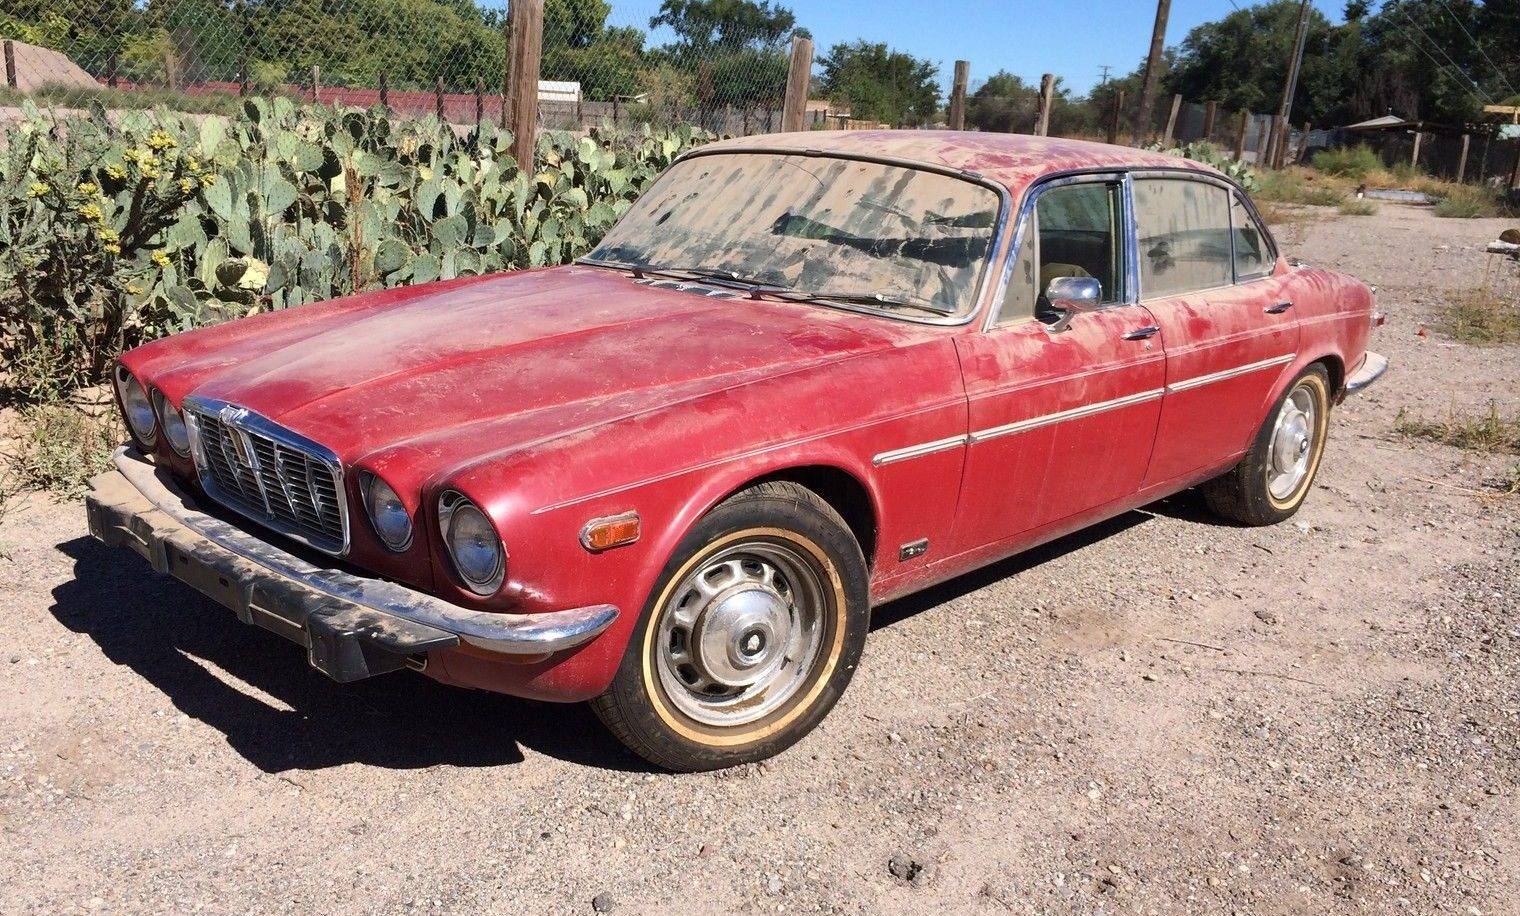 Junkyard Find: 1974 Jaguar XJ12